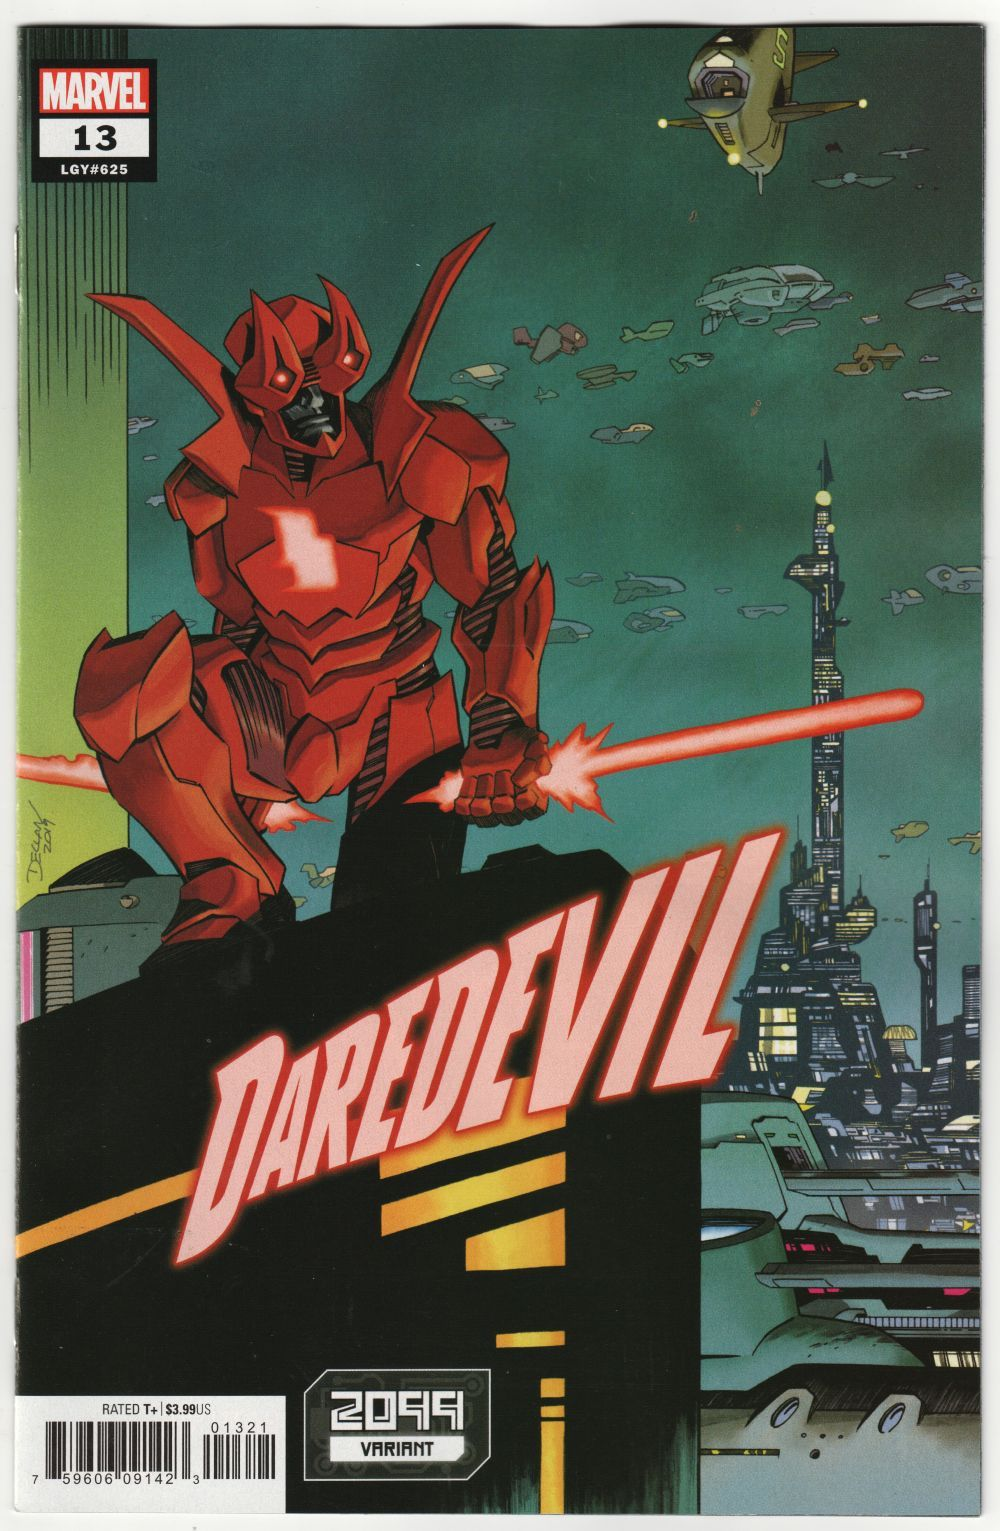 Daredevil 13 Shalvey 2099 Variant (Marvel, 2020) NM